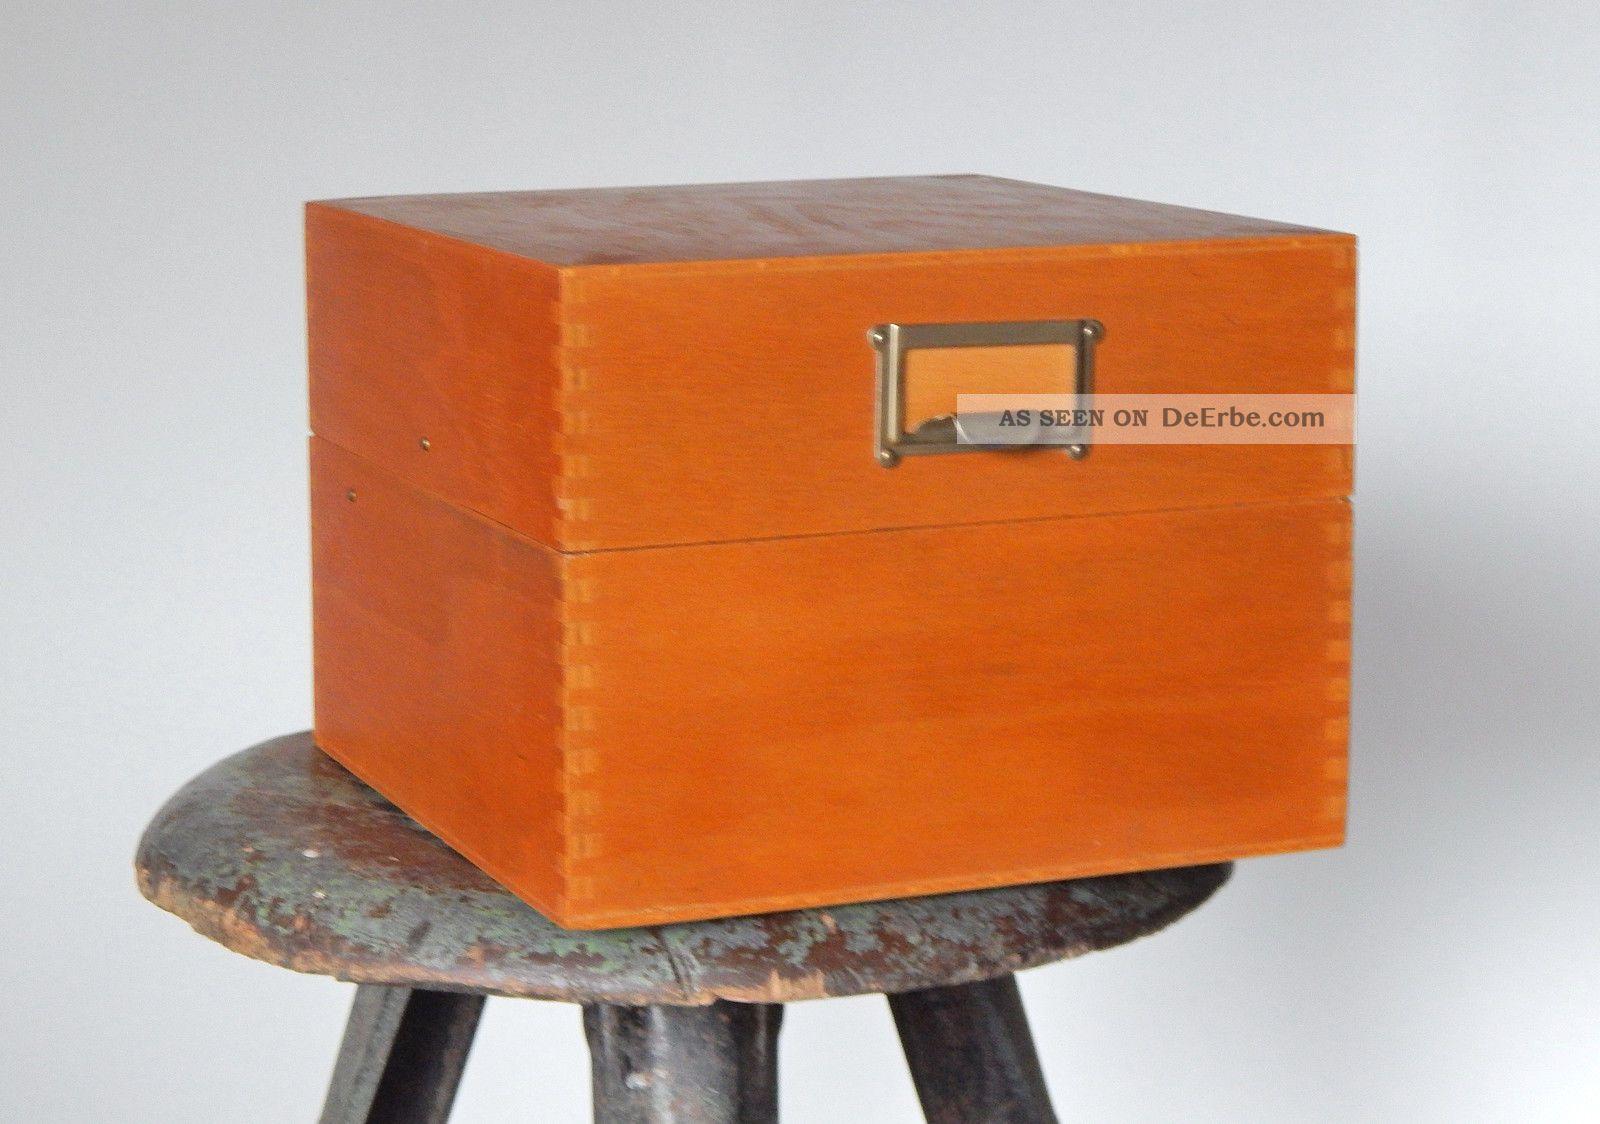 kleiner buche affordable amazing sideboard kleiner schrank buche in with kleiner buche. Black Bedroom Furniture Sets. Home Design Ideas